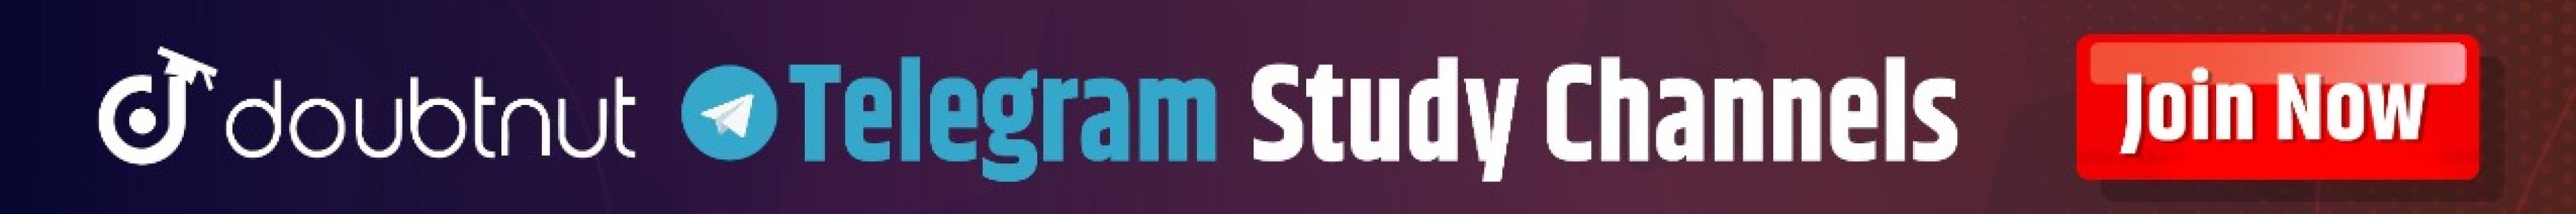 telegram channel banner